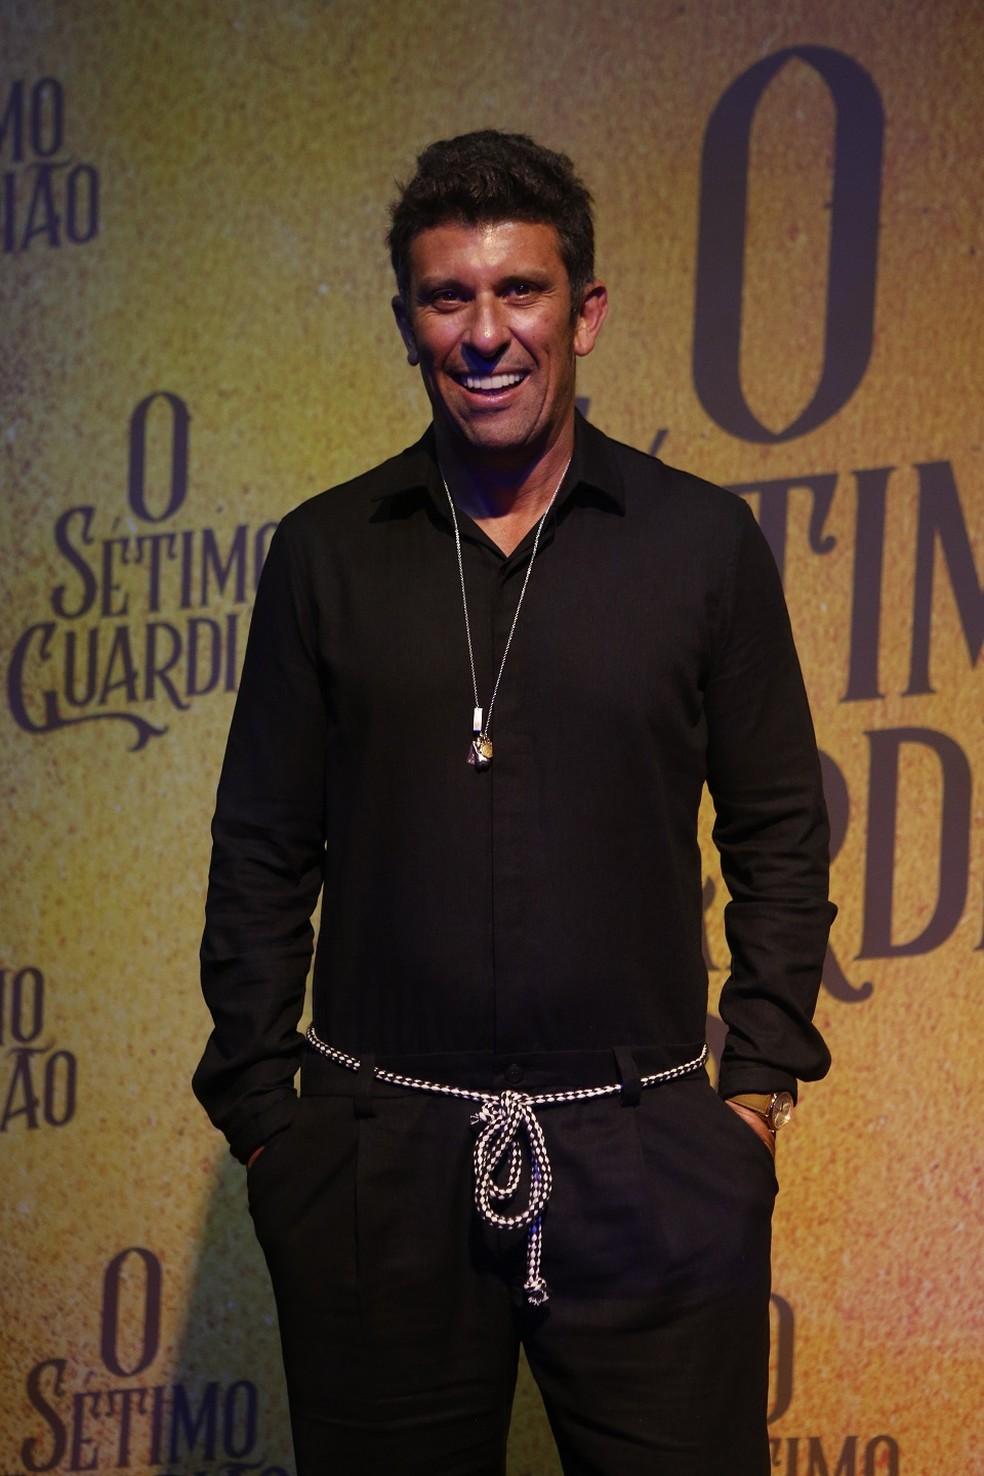 Milhem Cortaz será o delegado Machado, na nova novela das 9 — Foto: Fabiano Battaglin/Gshow